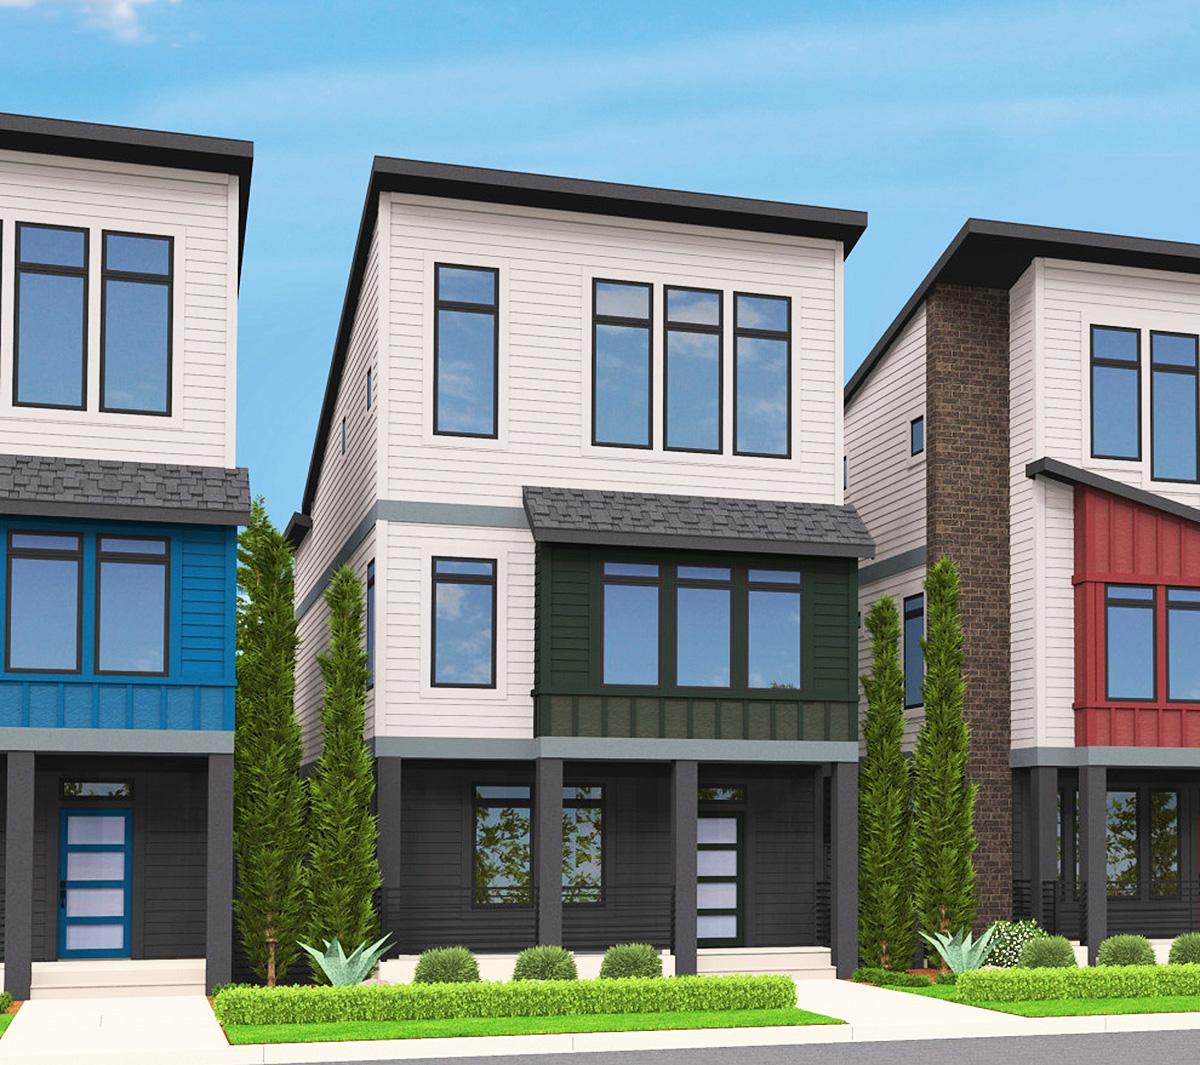 Design Homes Floor Plans: Narrow Lot Townhouse - 85124MS